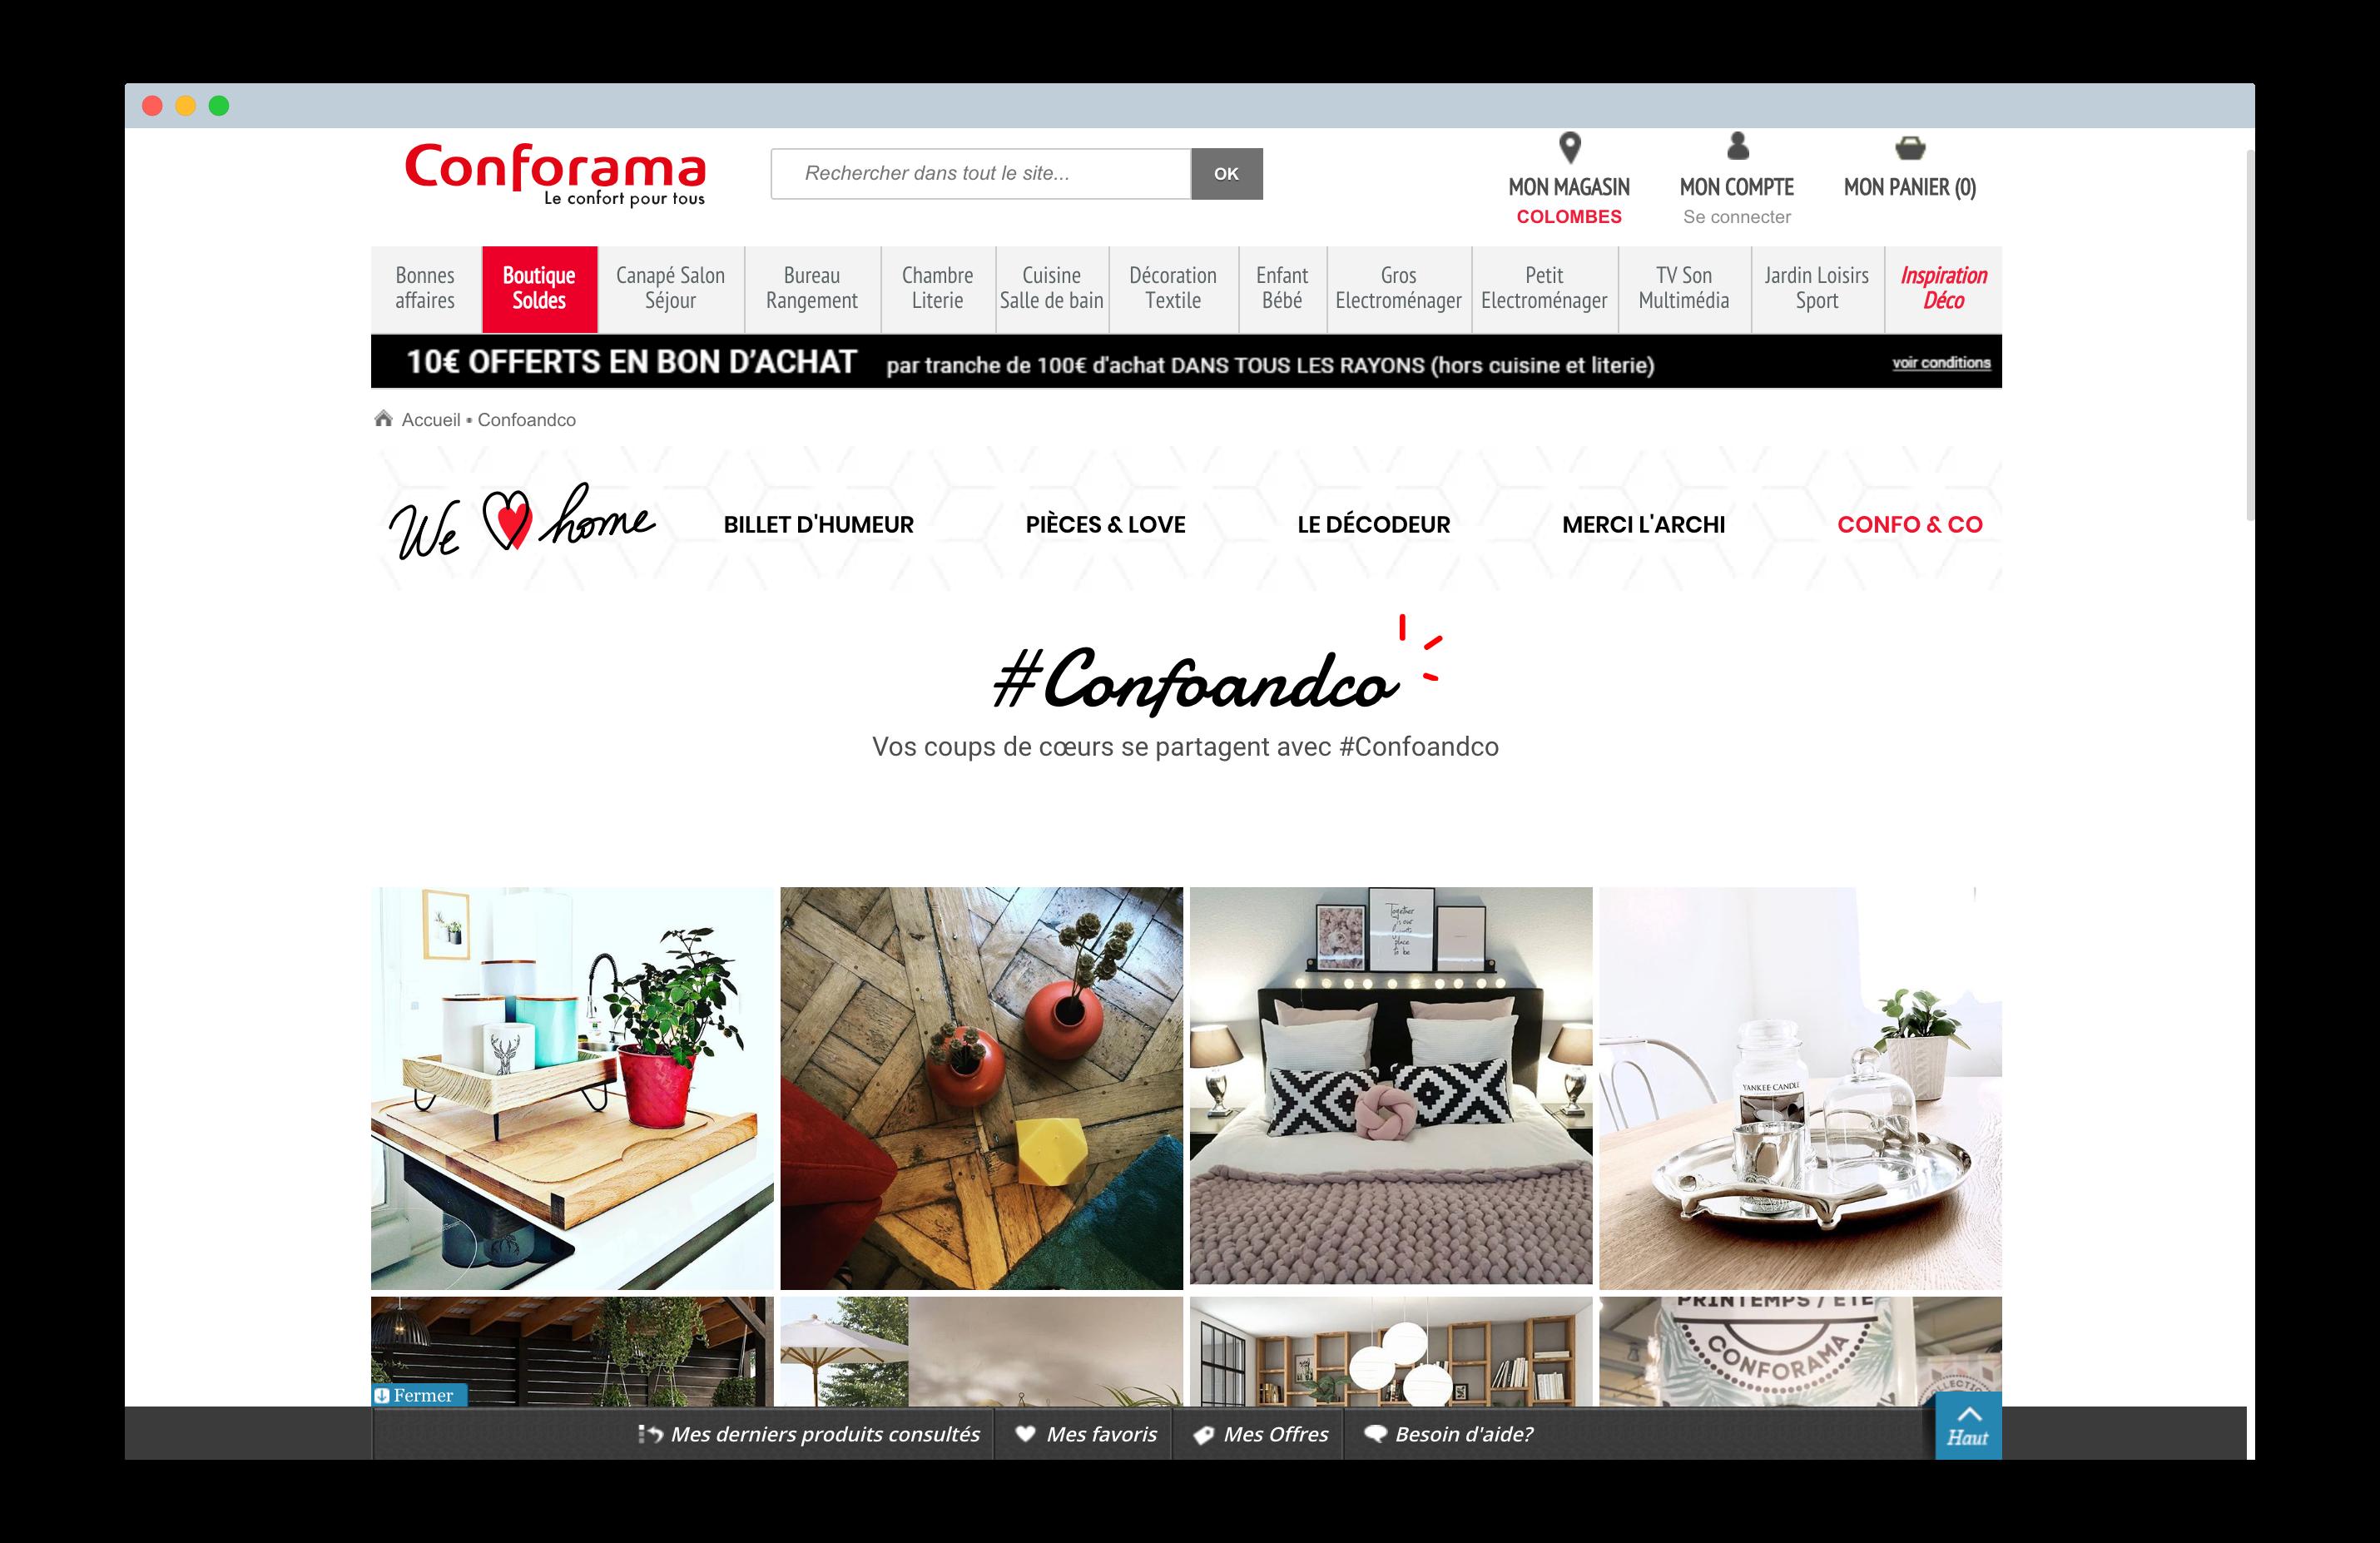 social wall webcast conforama